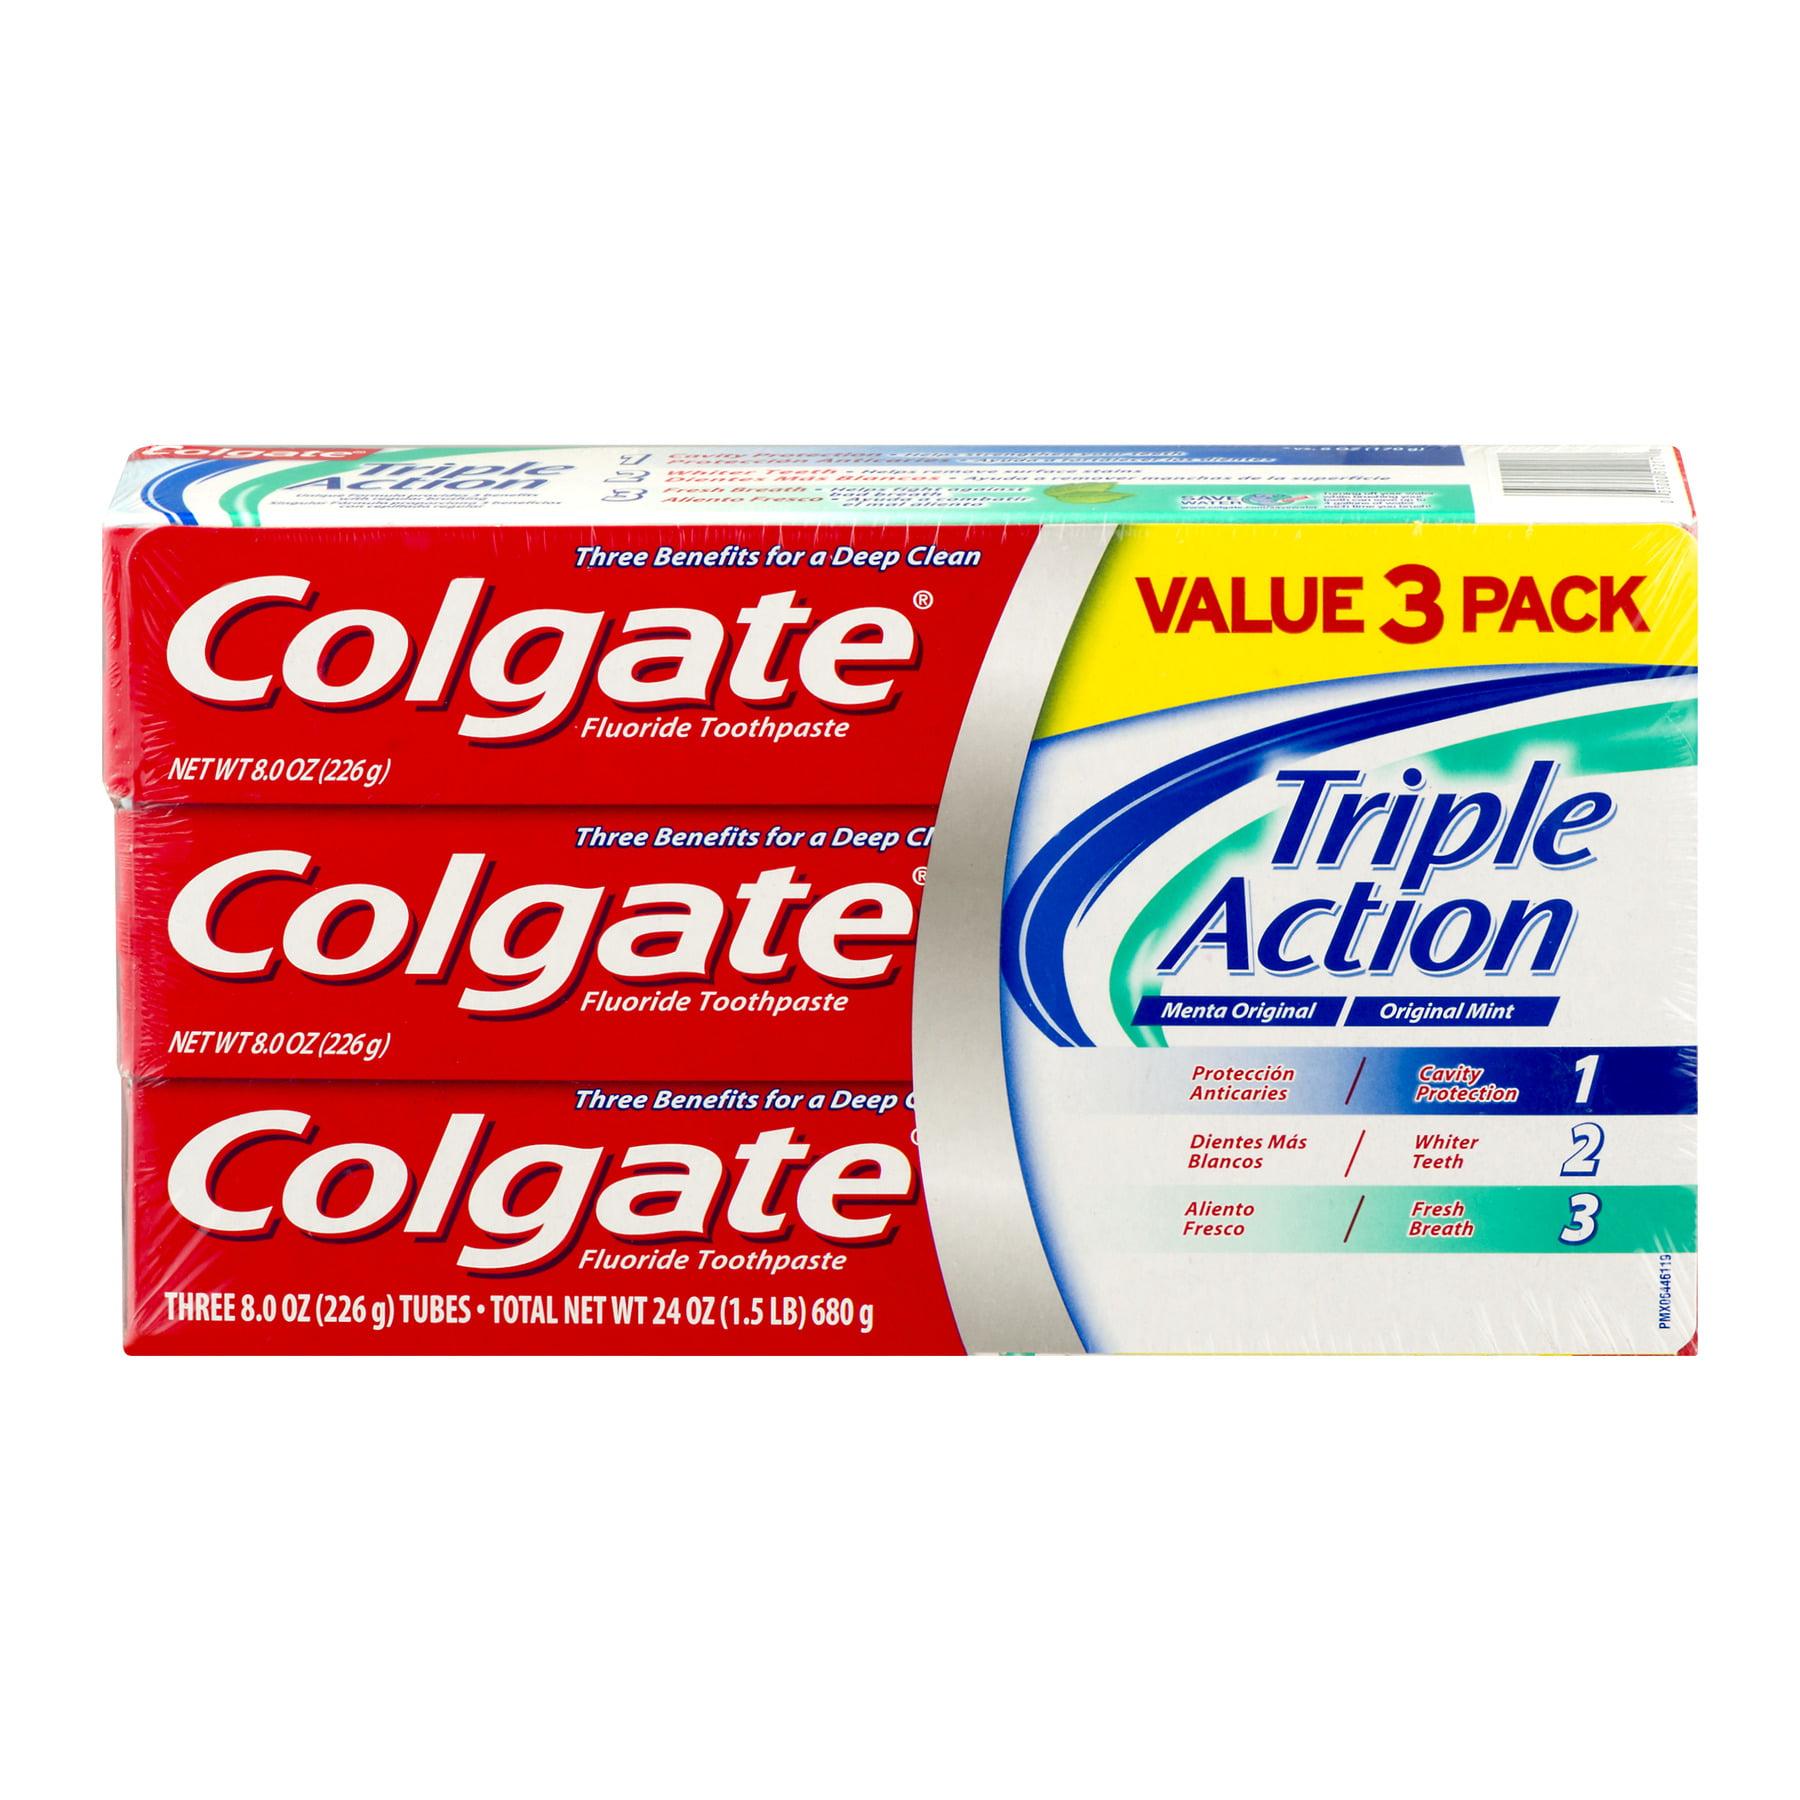 Colgate Triple Action Original Mint Fluoride Toothpaste Value Pack, 8.0 oz, 3 count